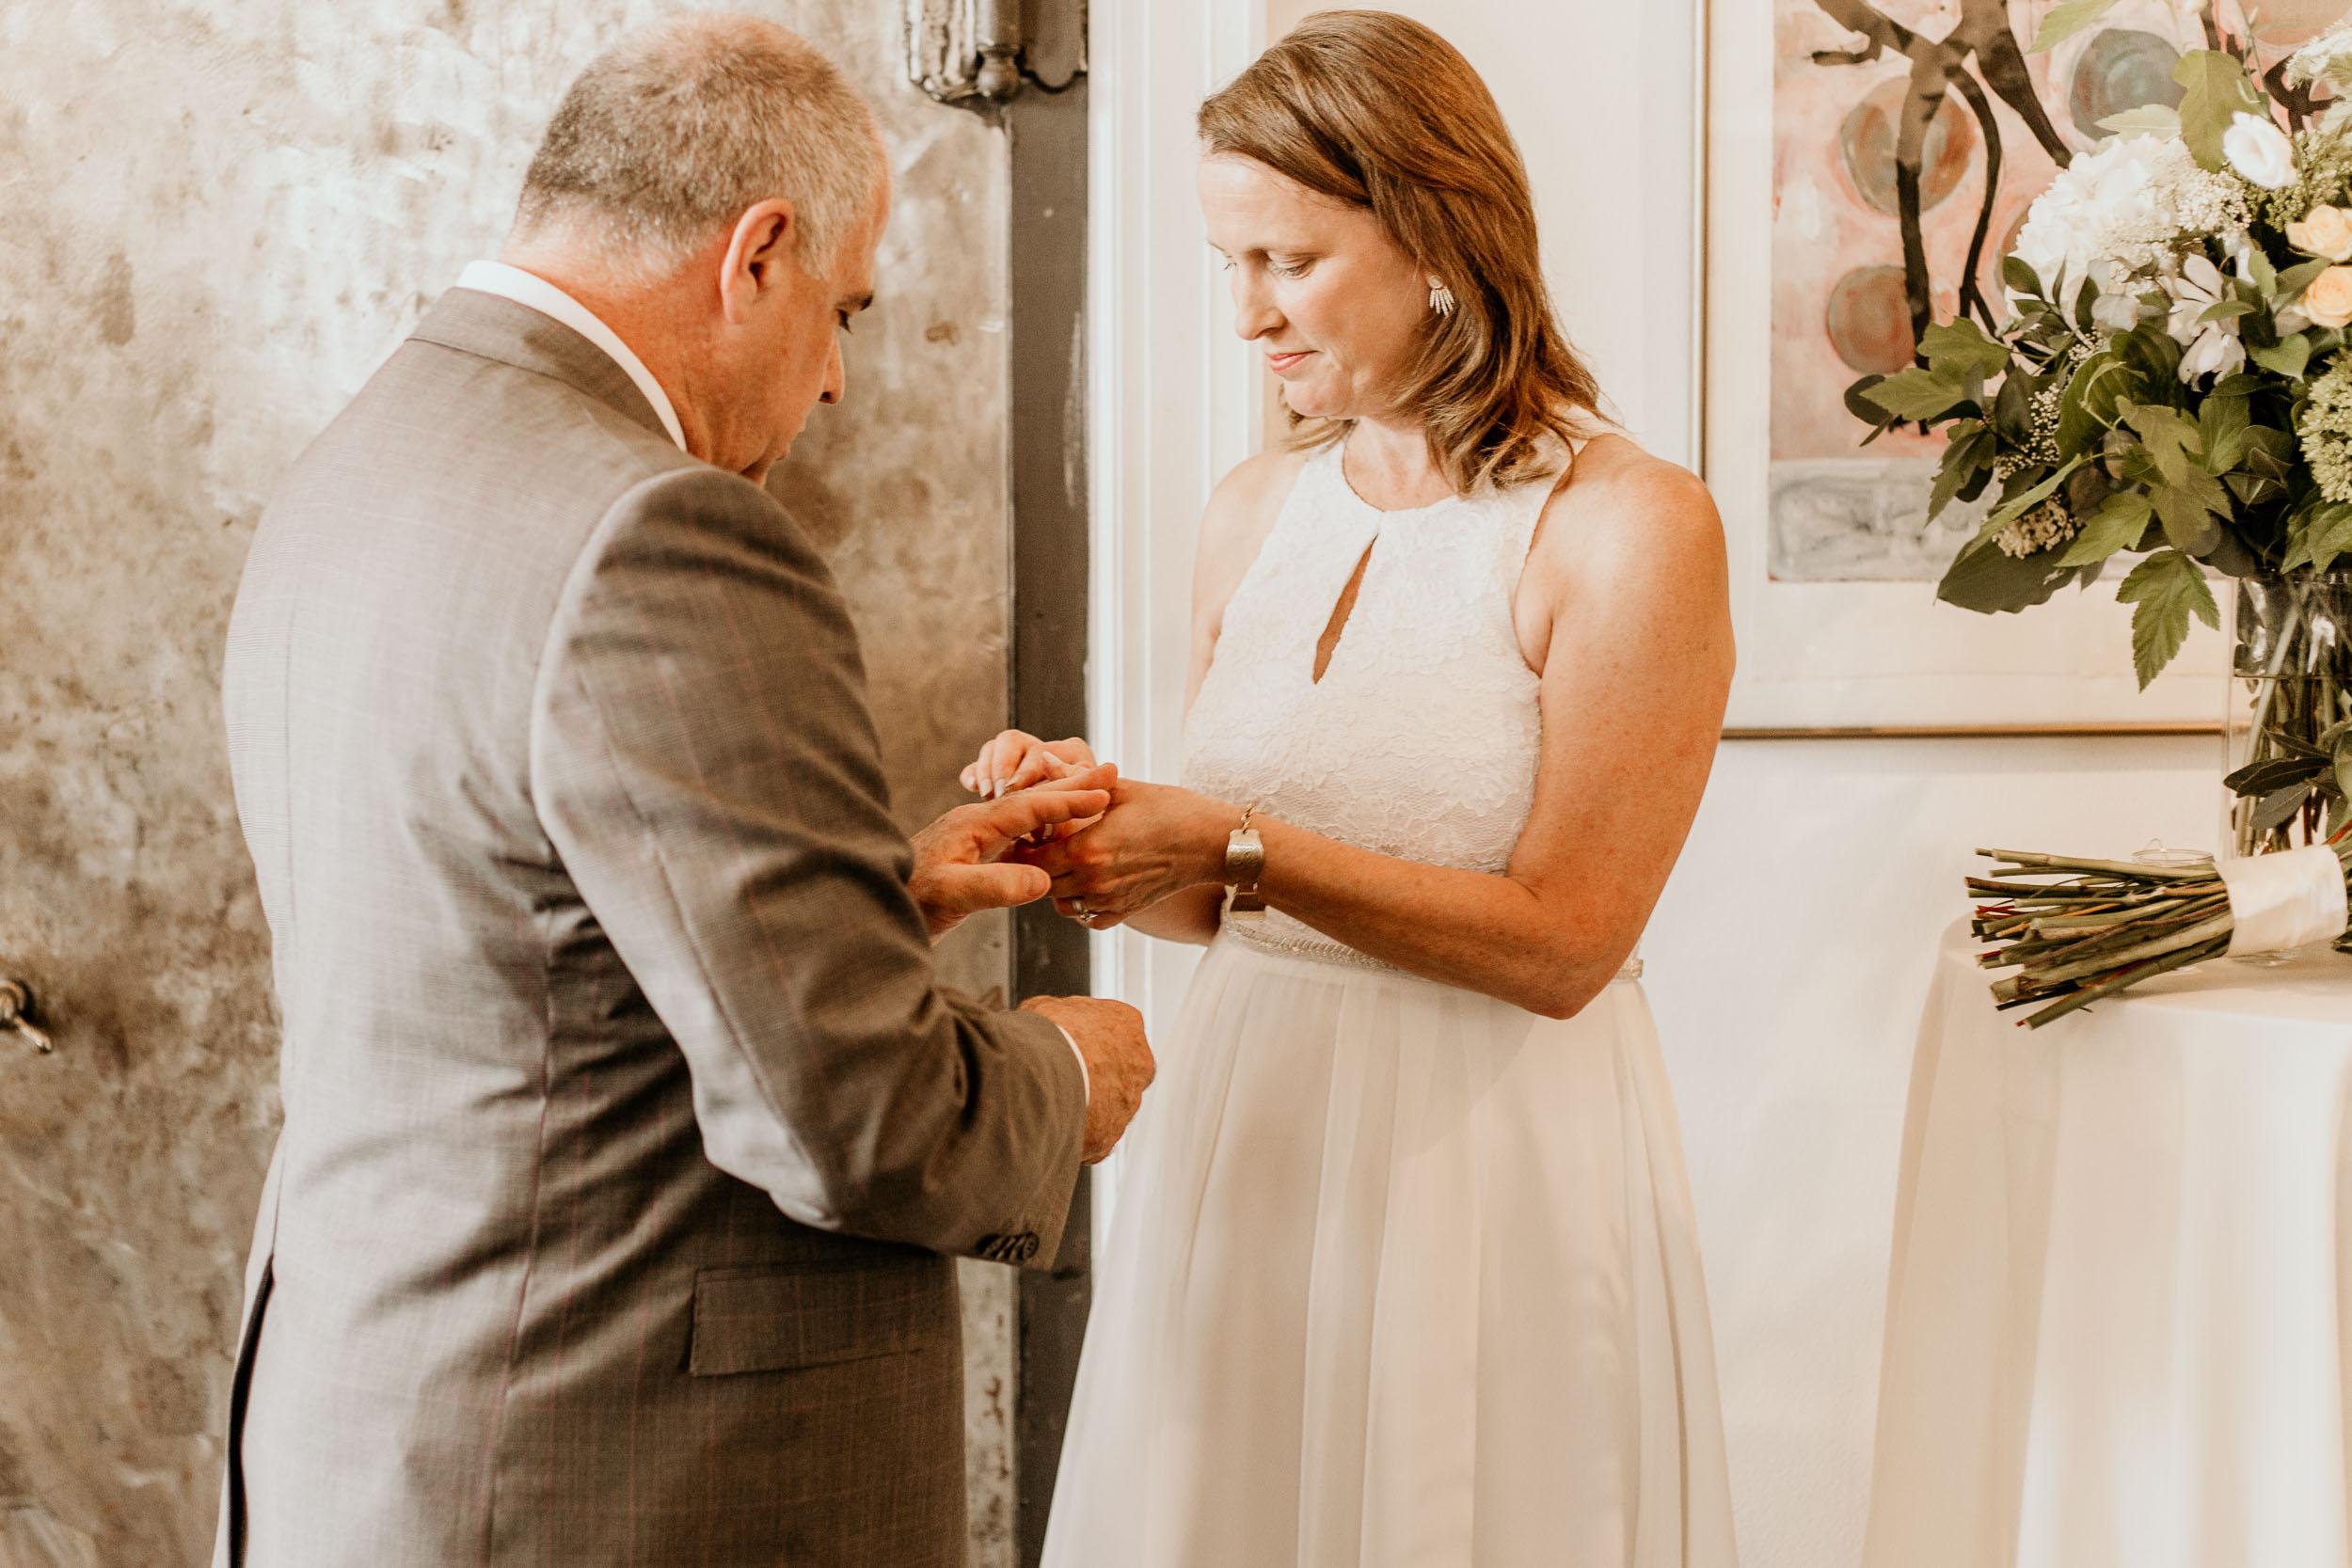 elopement-engagement-photographer-ottawa-4388.jpg